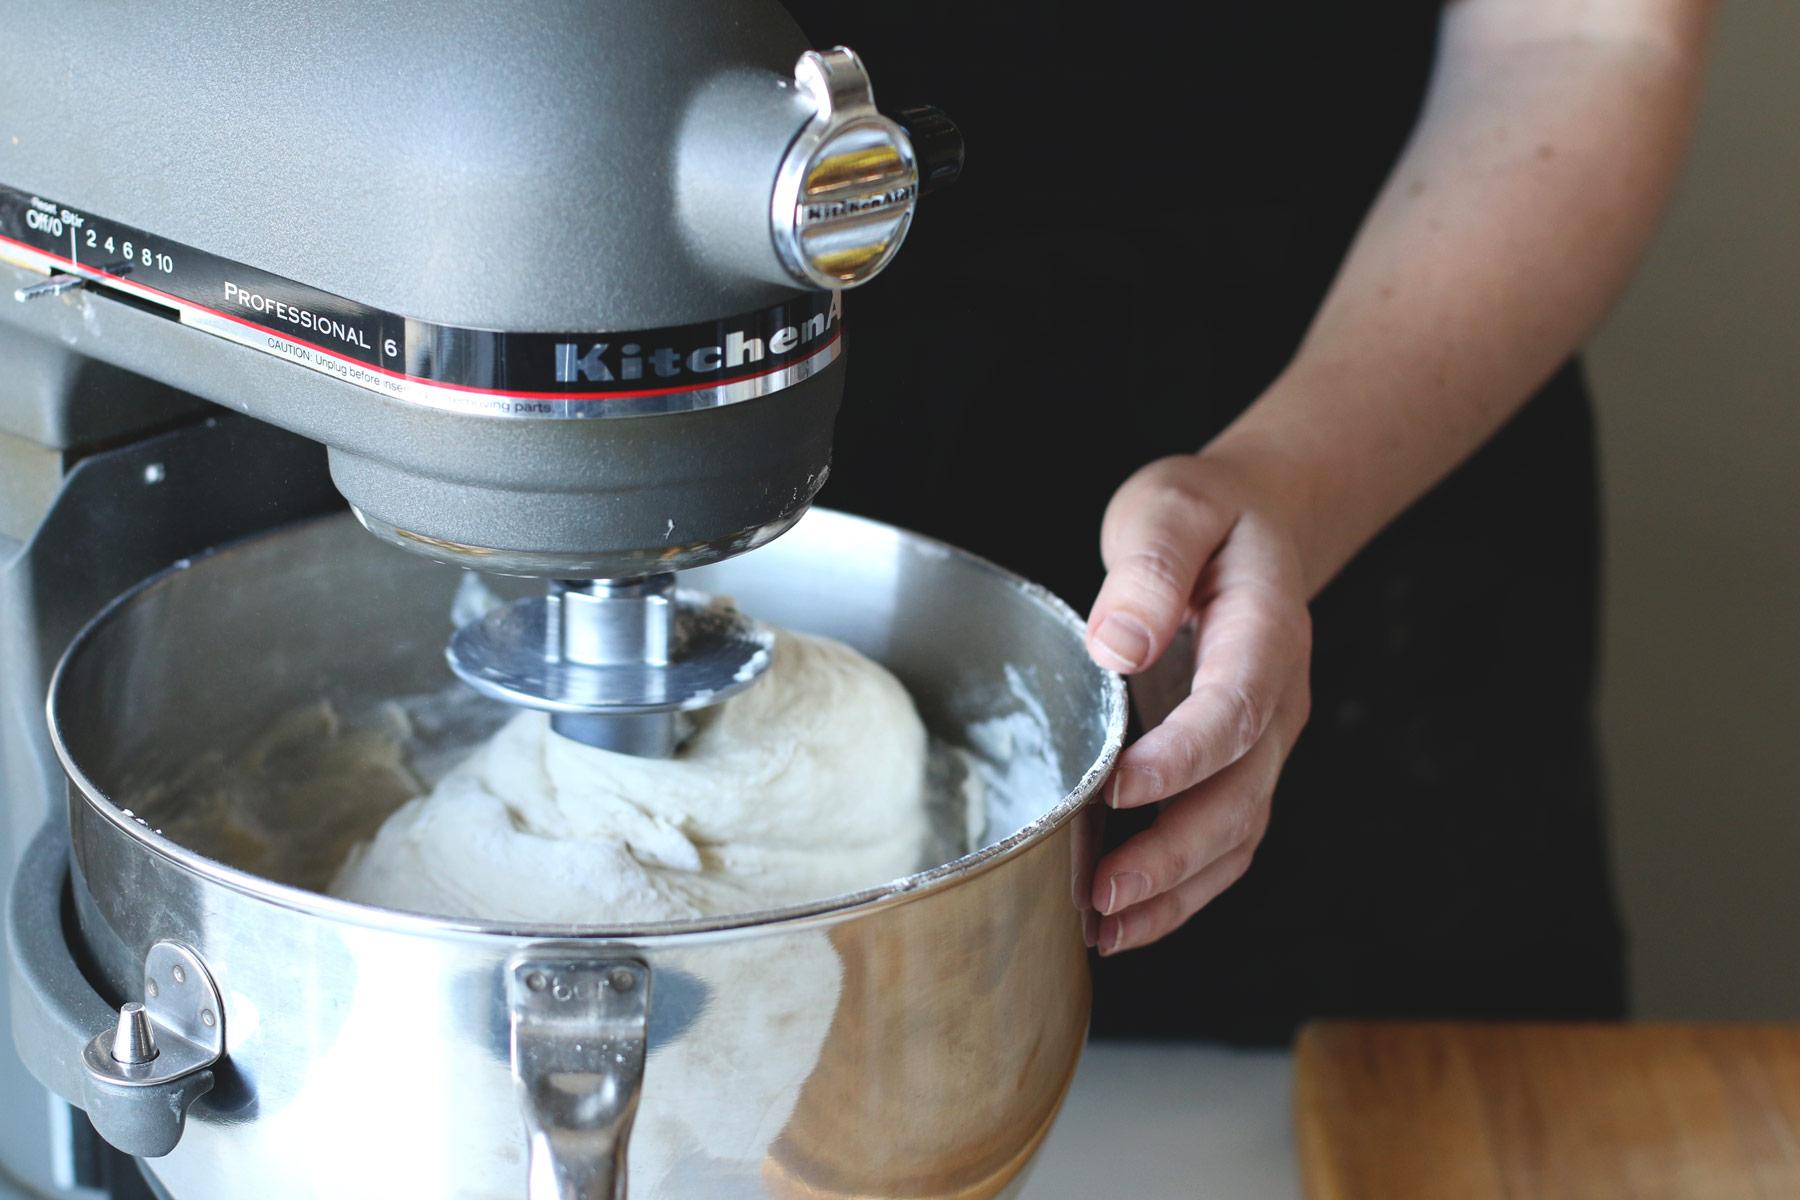 Bread in mixer